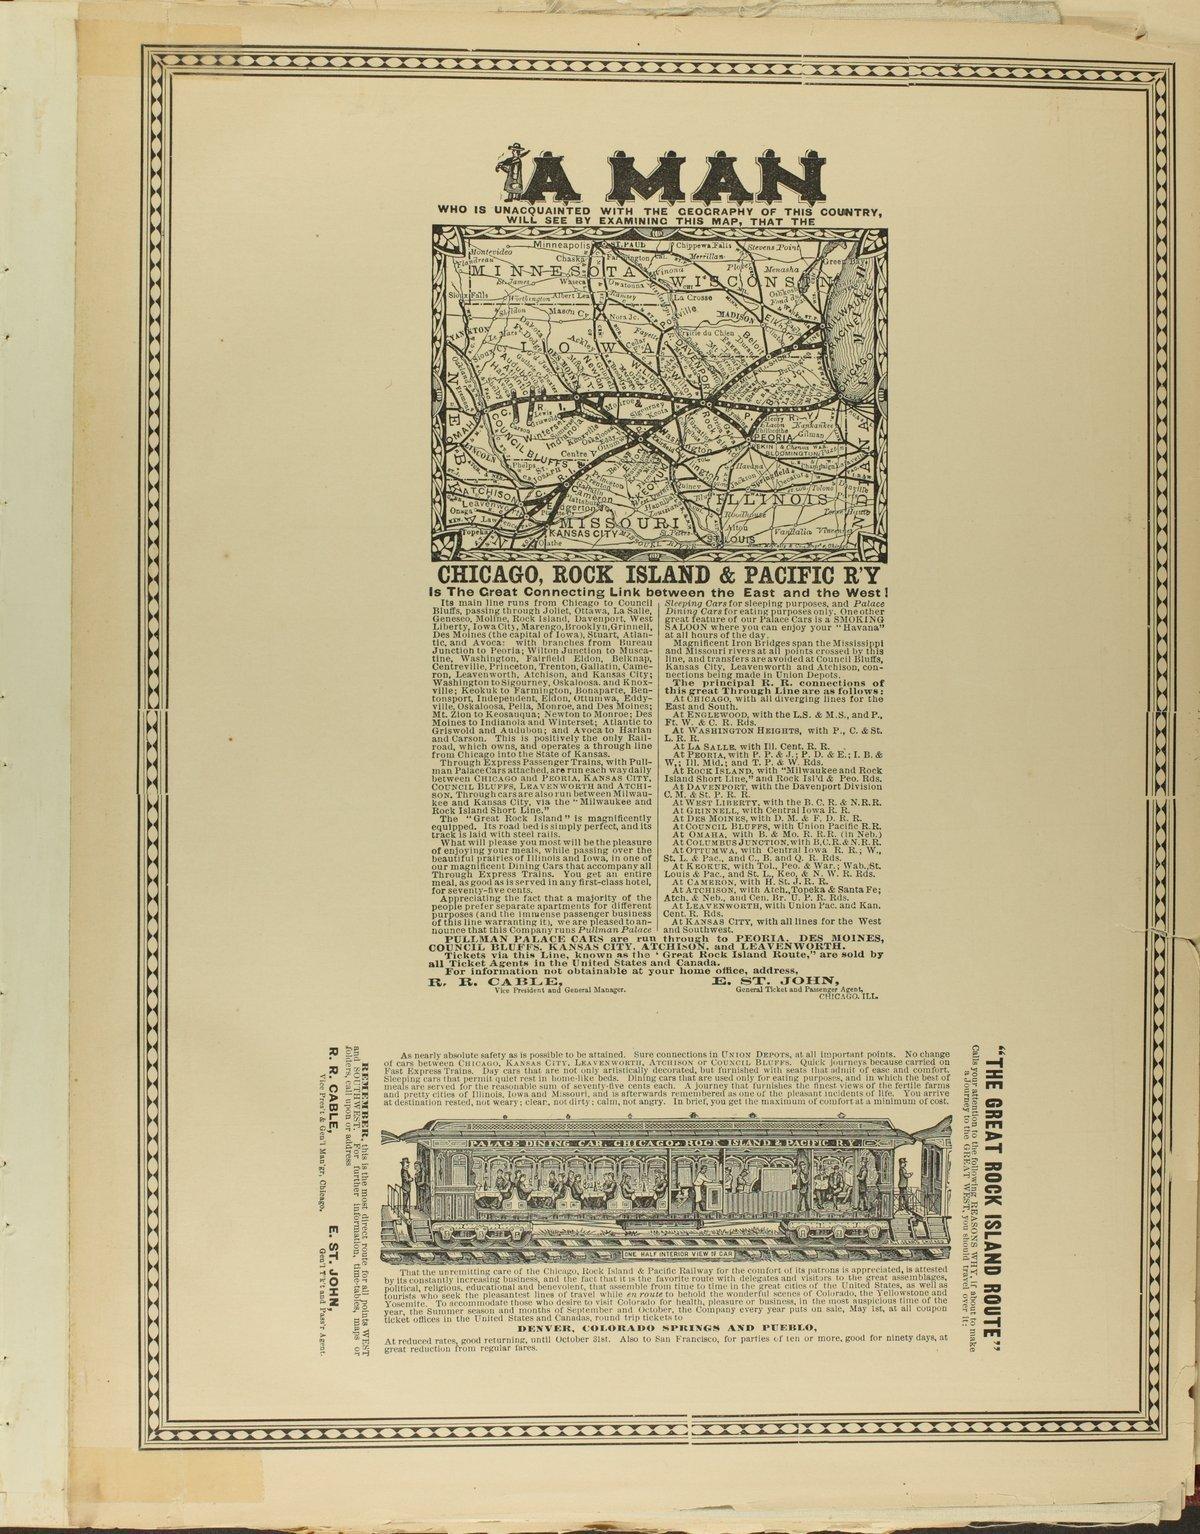 Historical plat book of Doniphan County, Kansas - advertisement